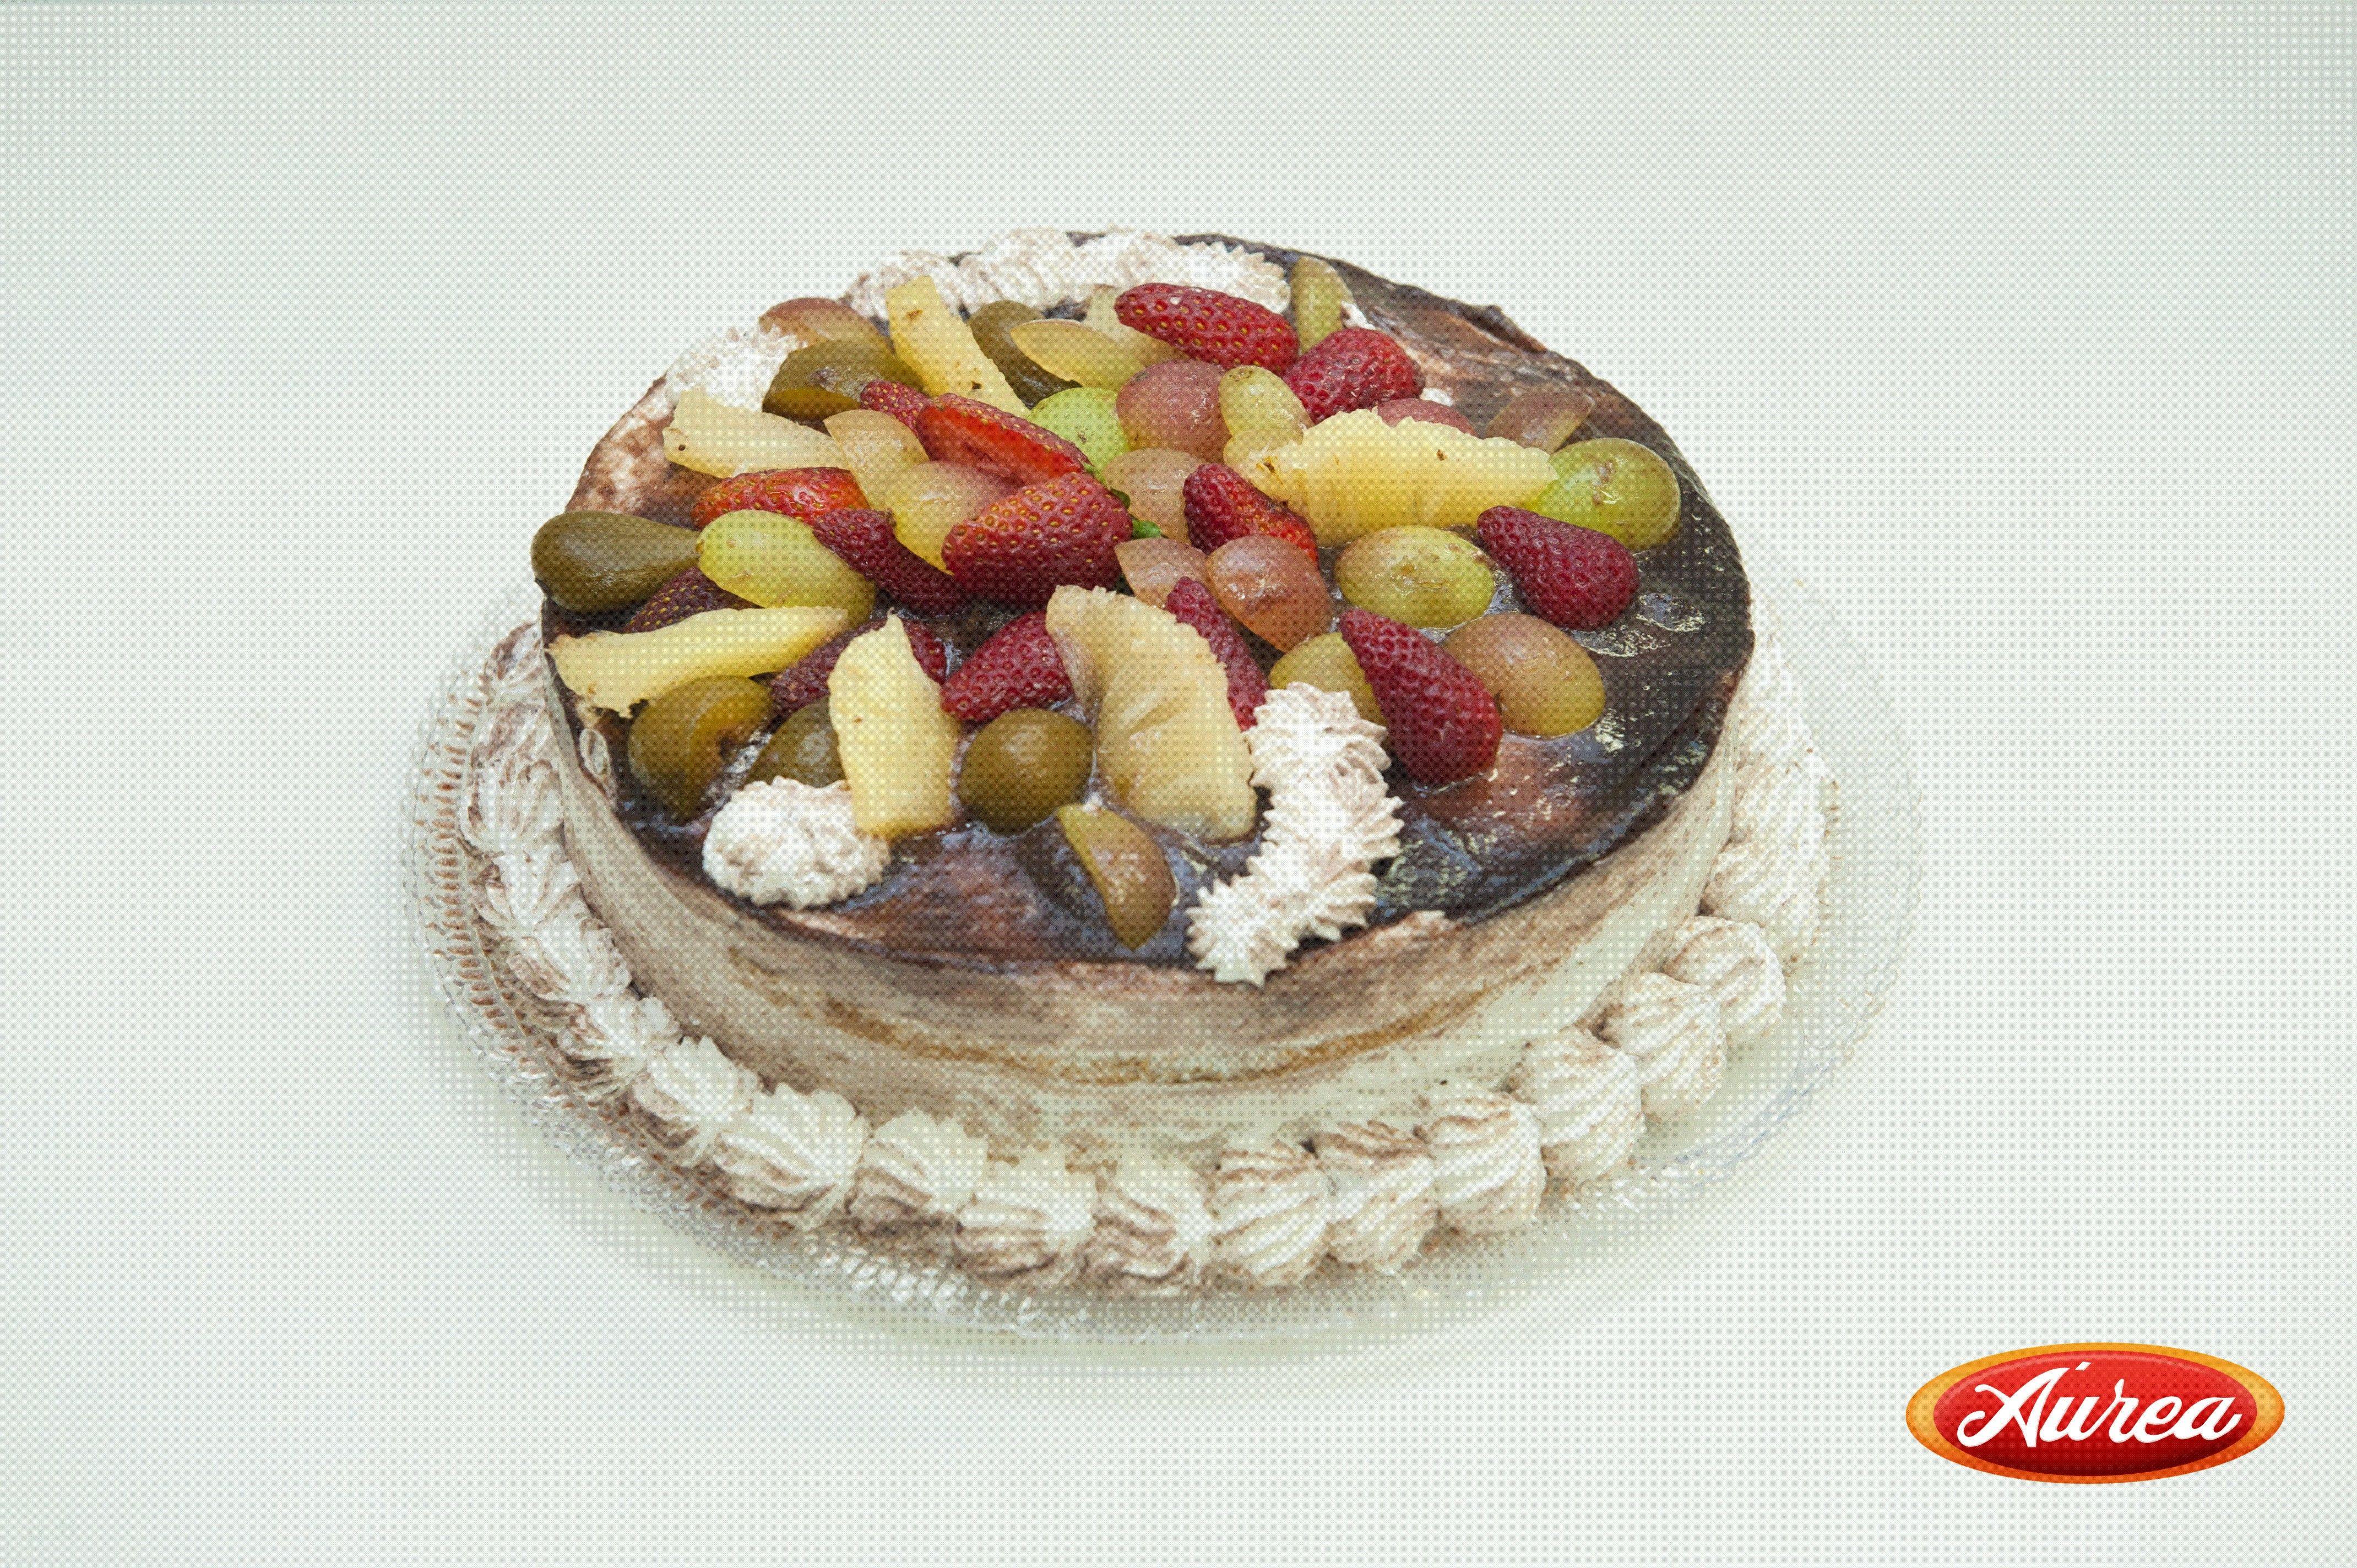 Torta Tropical – Áurea